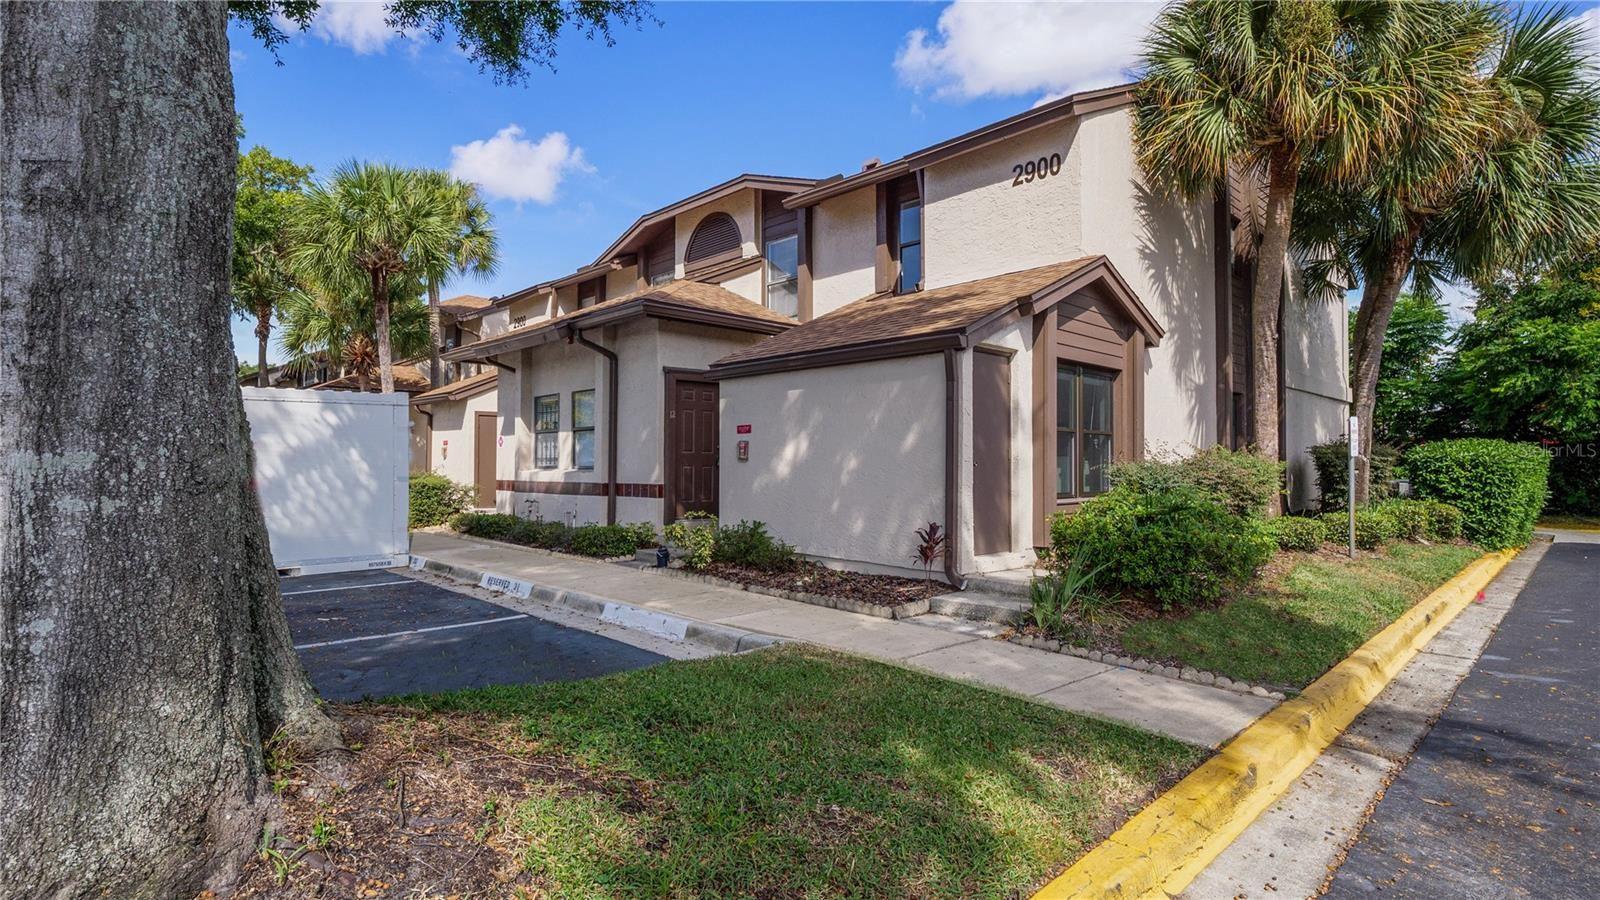 2900 S SEMORAN BOULEVARD #12, Orlando, FL 32822 - #: O5978819